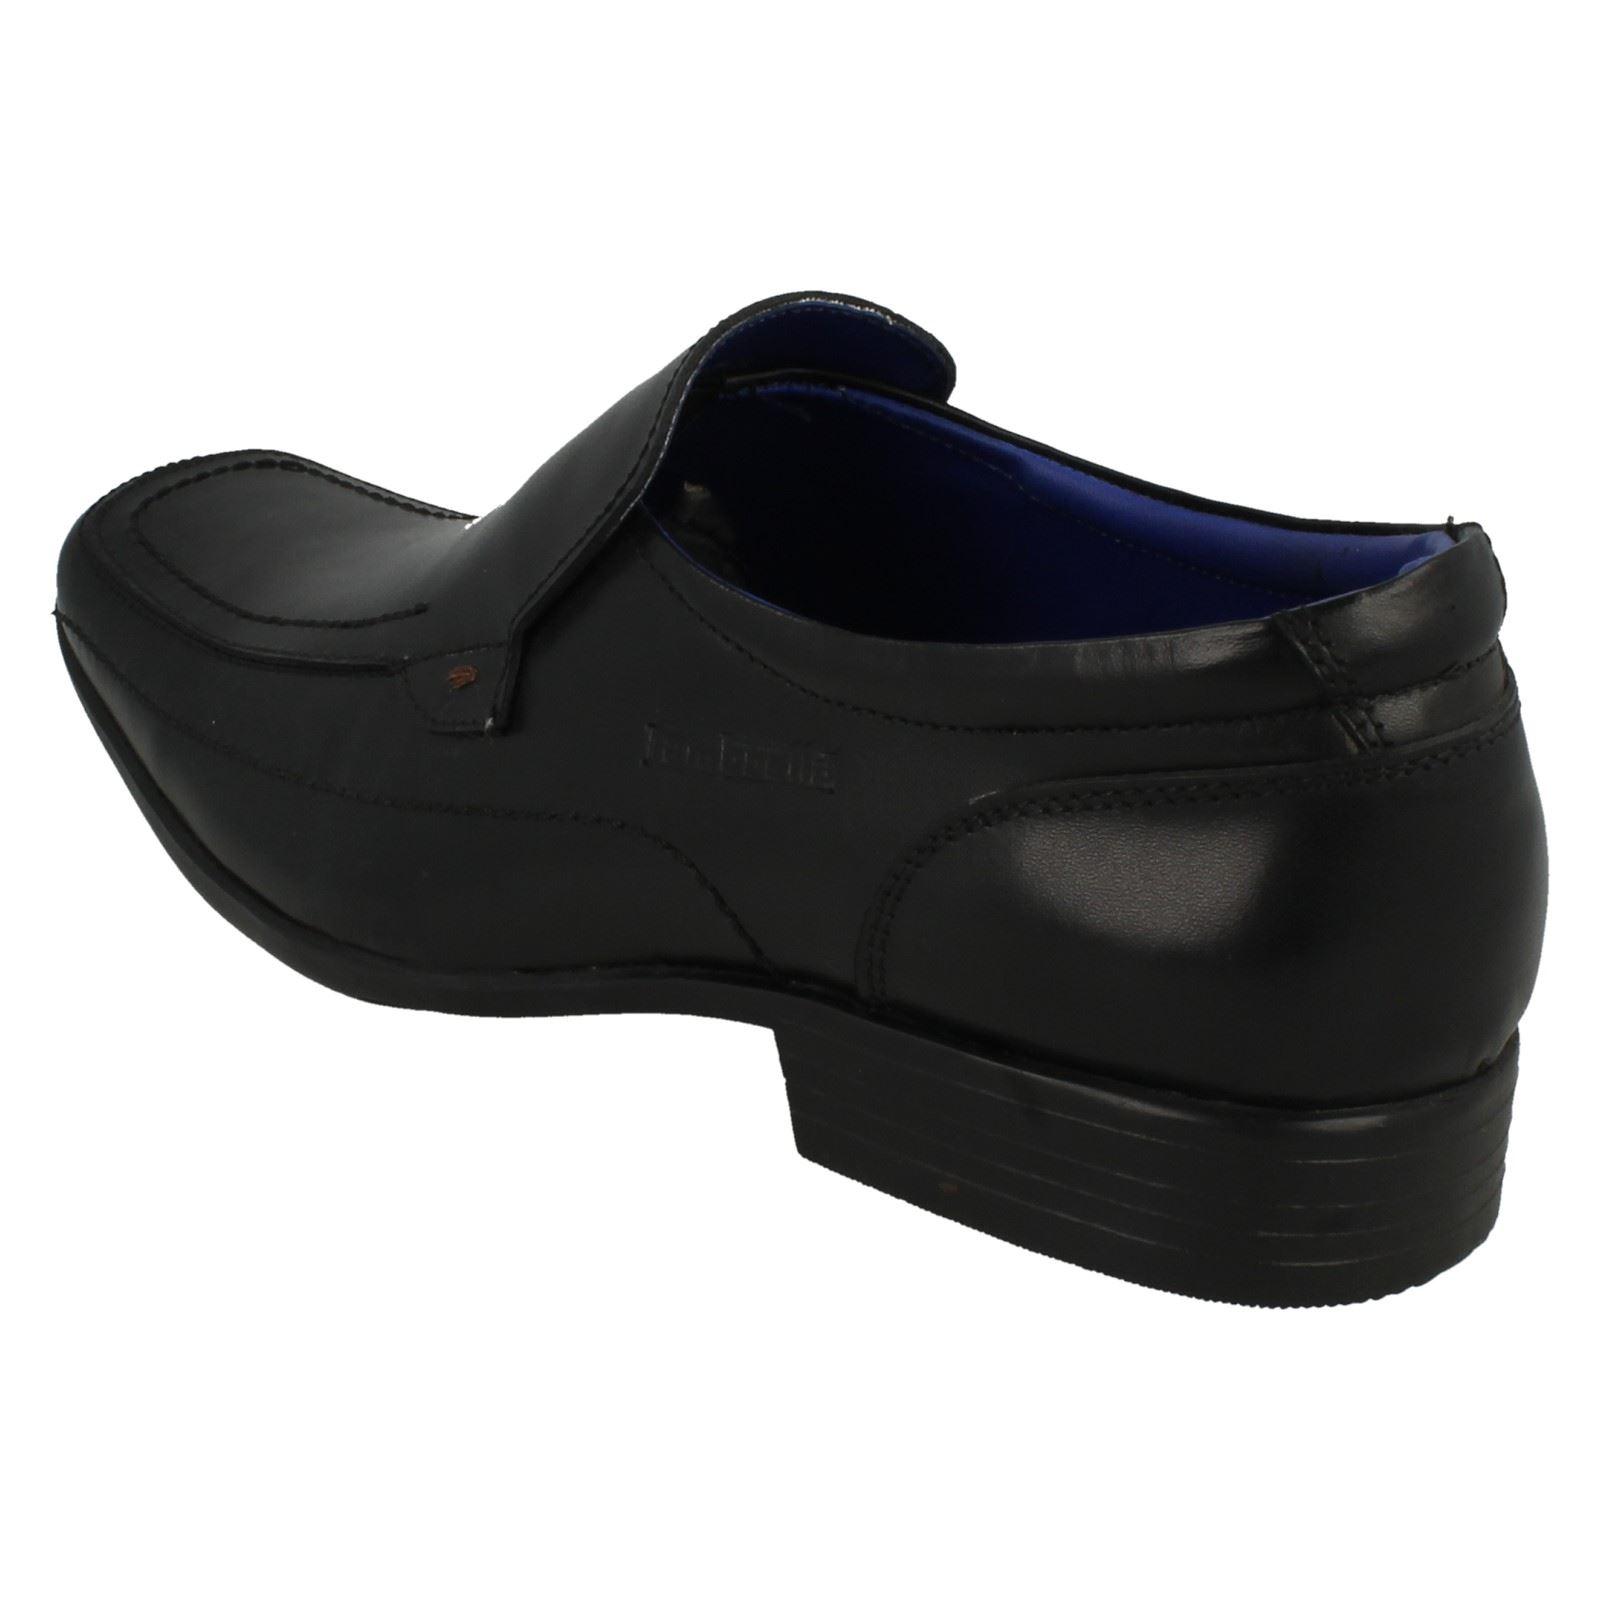 Hommes Chaussures Habillées Hommes Lambretta Lambretta '20287' Chaussures Habillées '20287' Hommes nqnwrxF